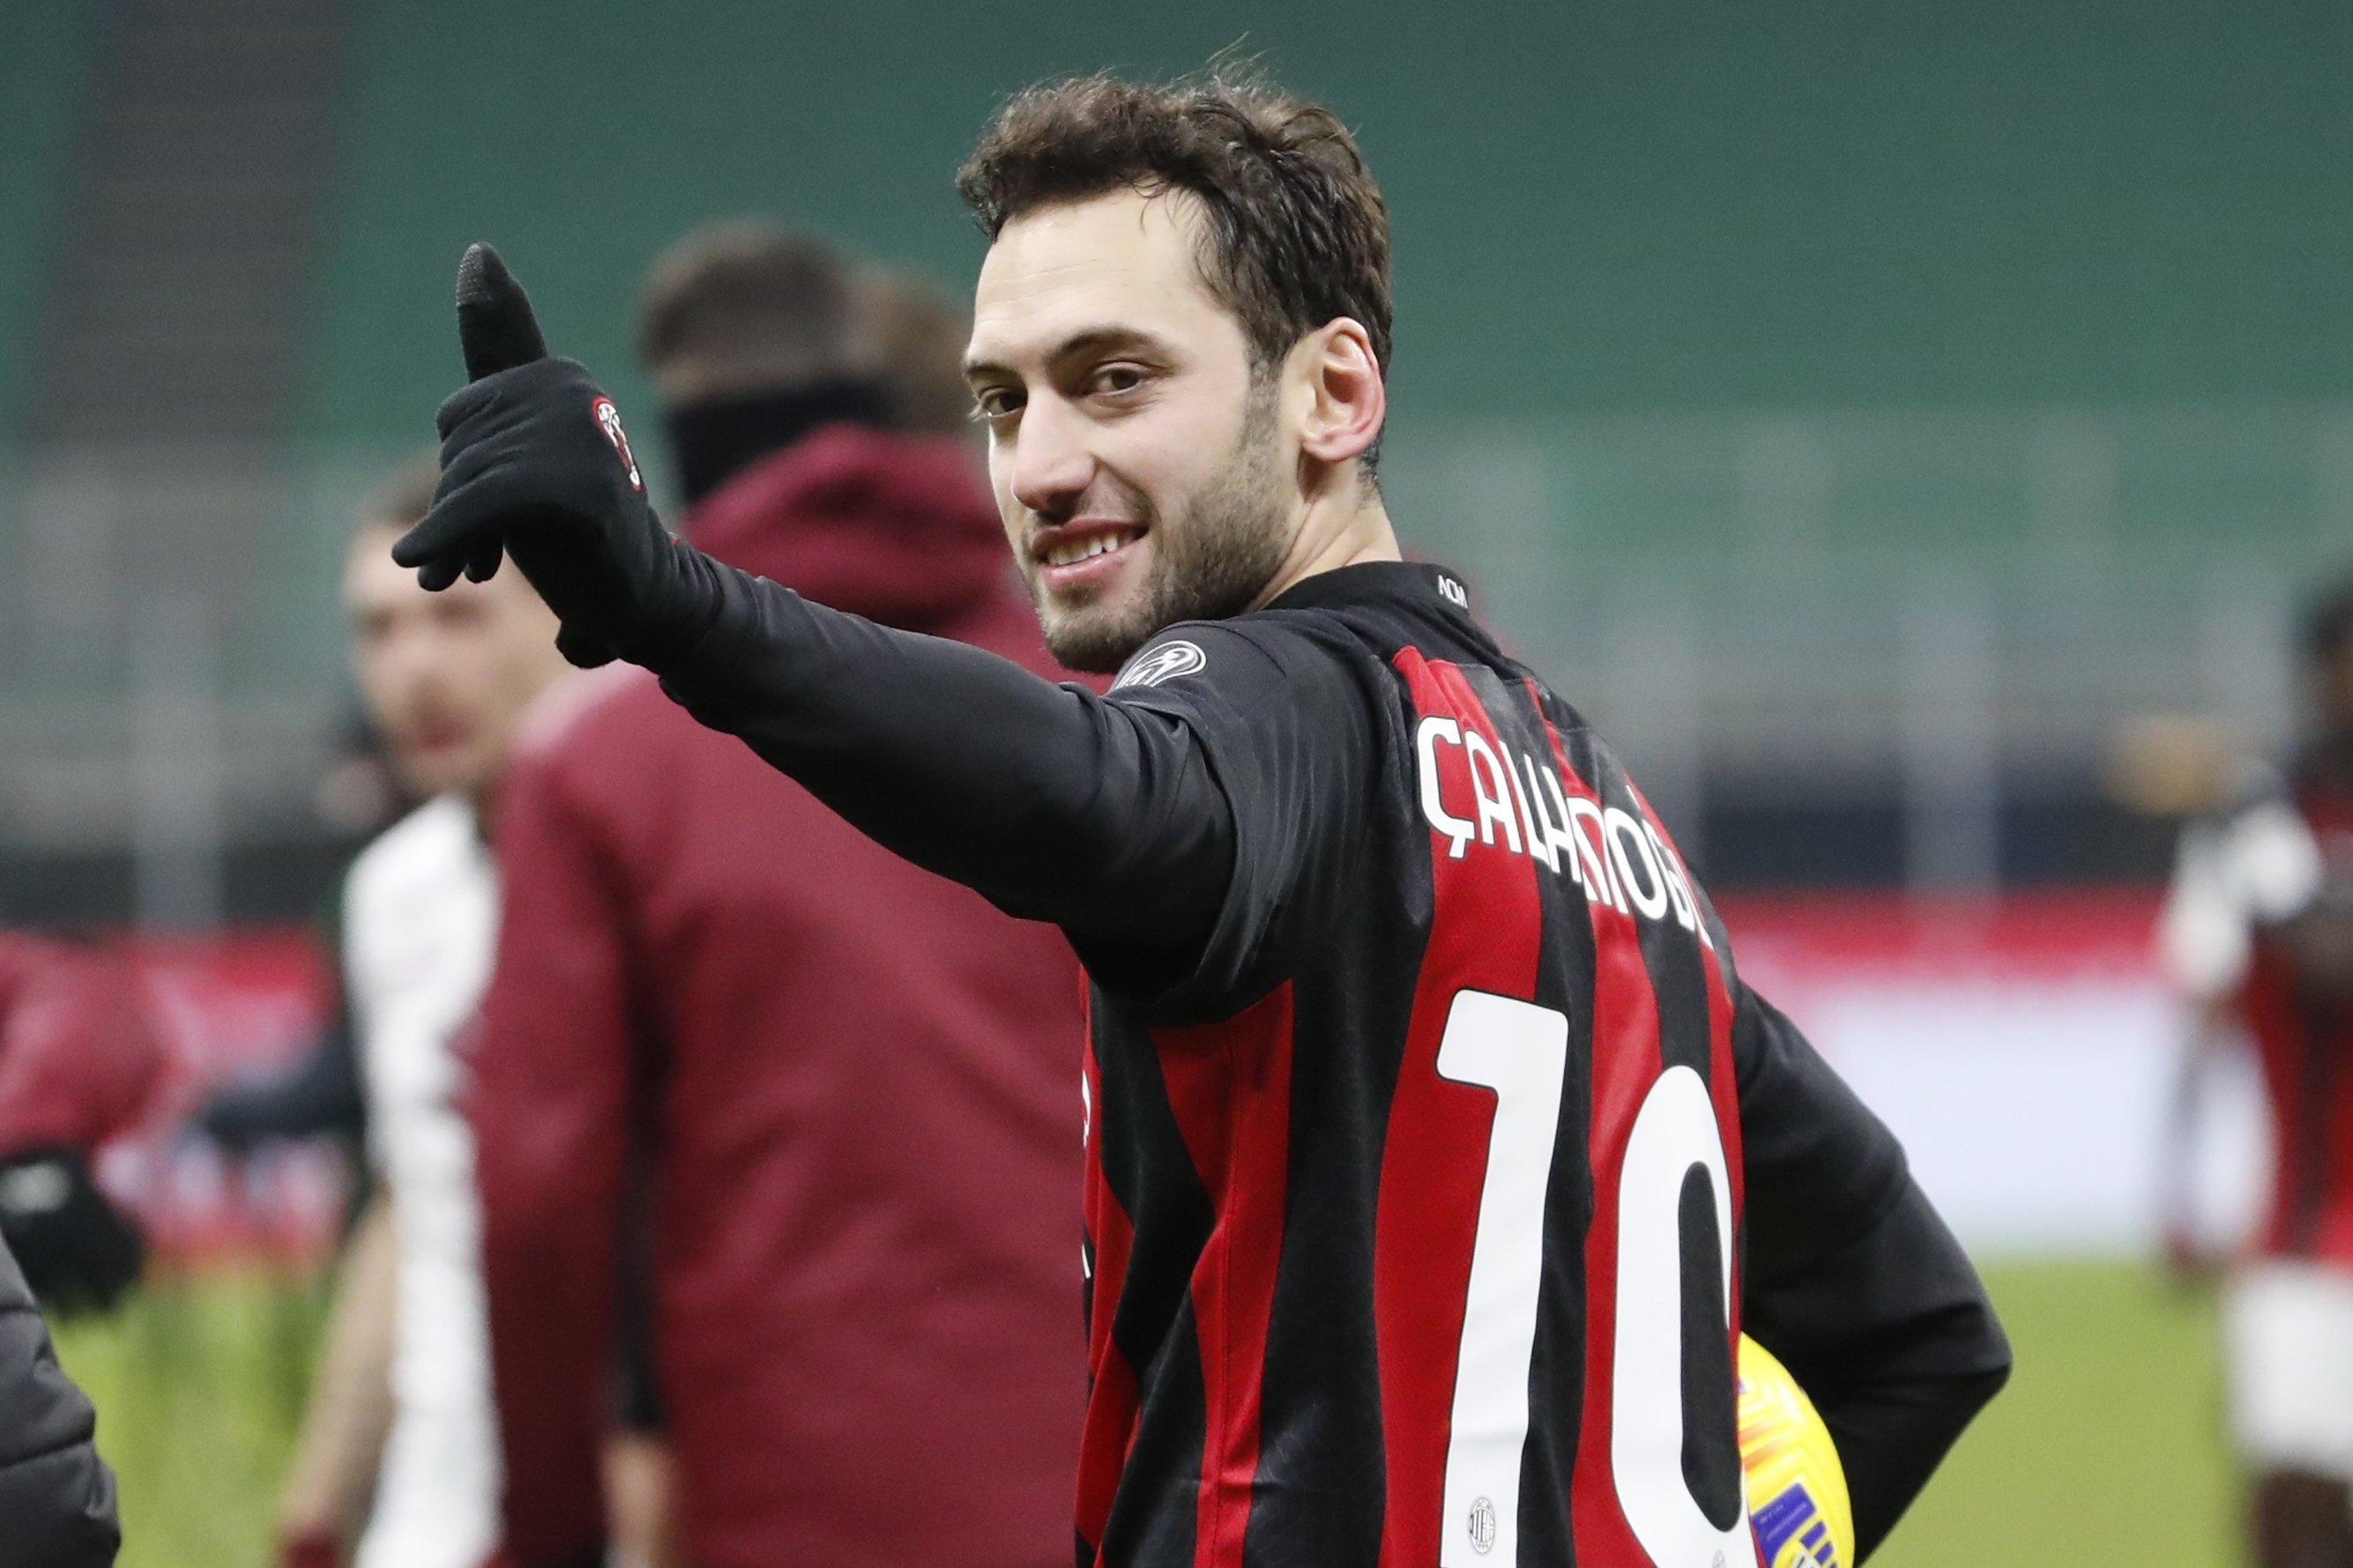 AC Milan's Çalhanoglu, Hernandez test positive for coronavirus | Daily Sabah